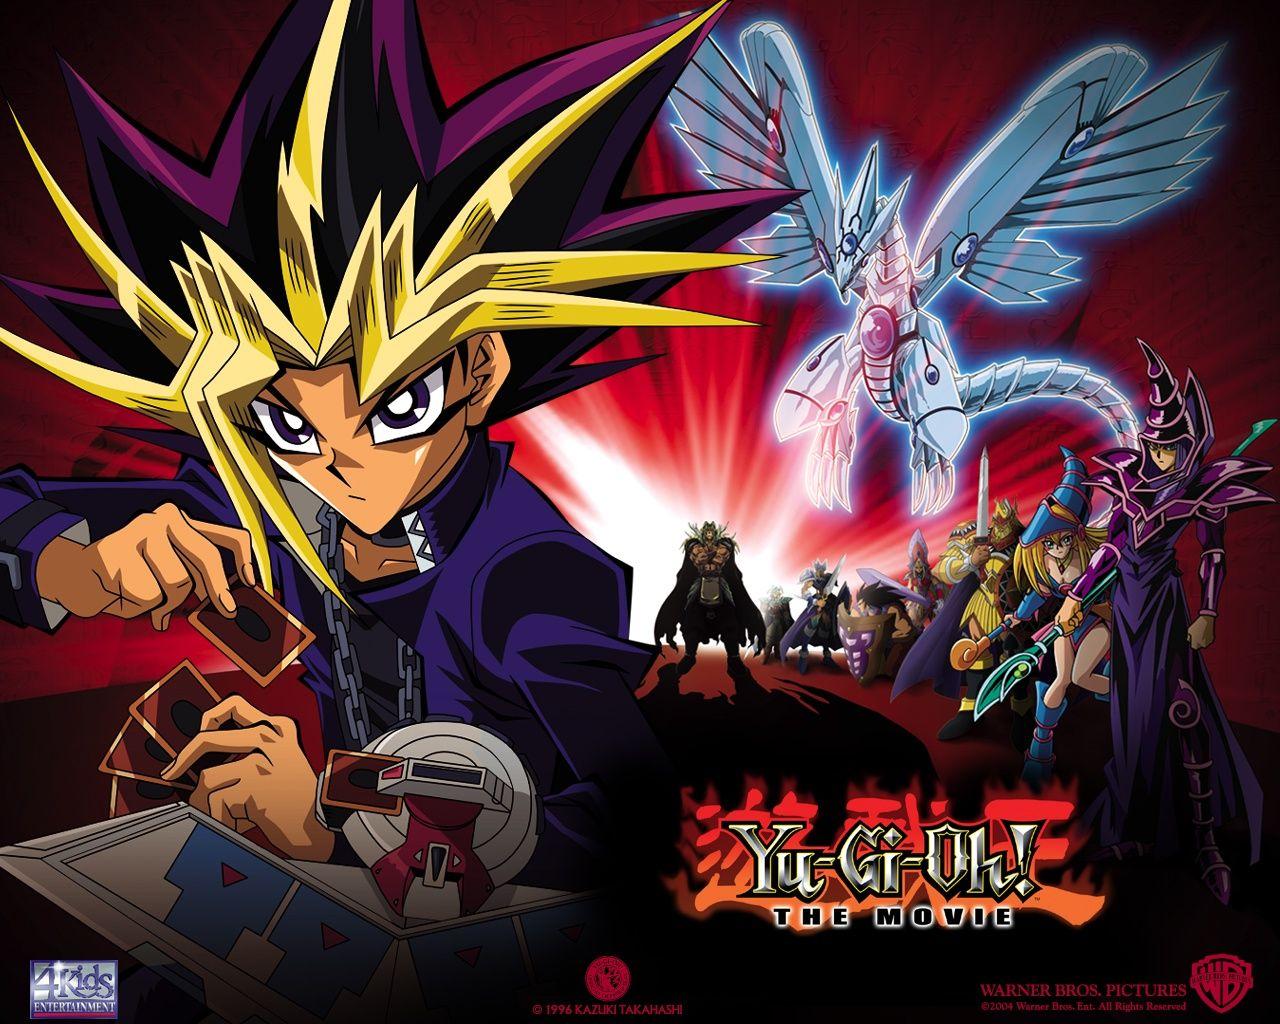 Yu Gi Oh Wallpaper Yu Gi Oh The Pyramid Of Light Anime Yugioh Yugioh Wallpapers